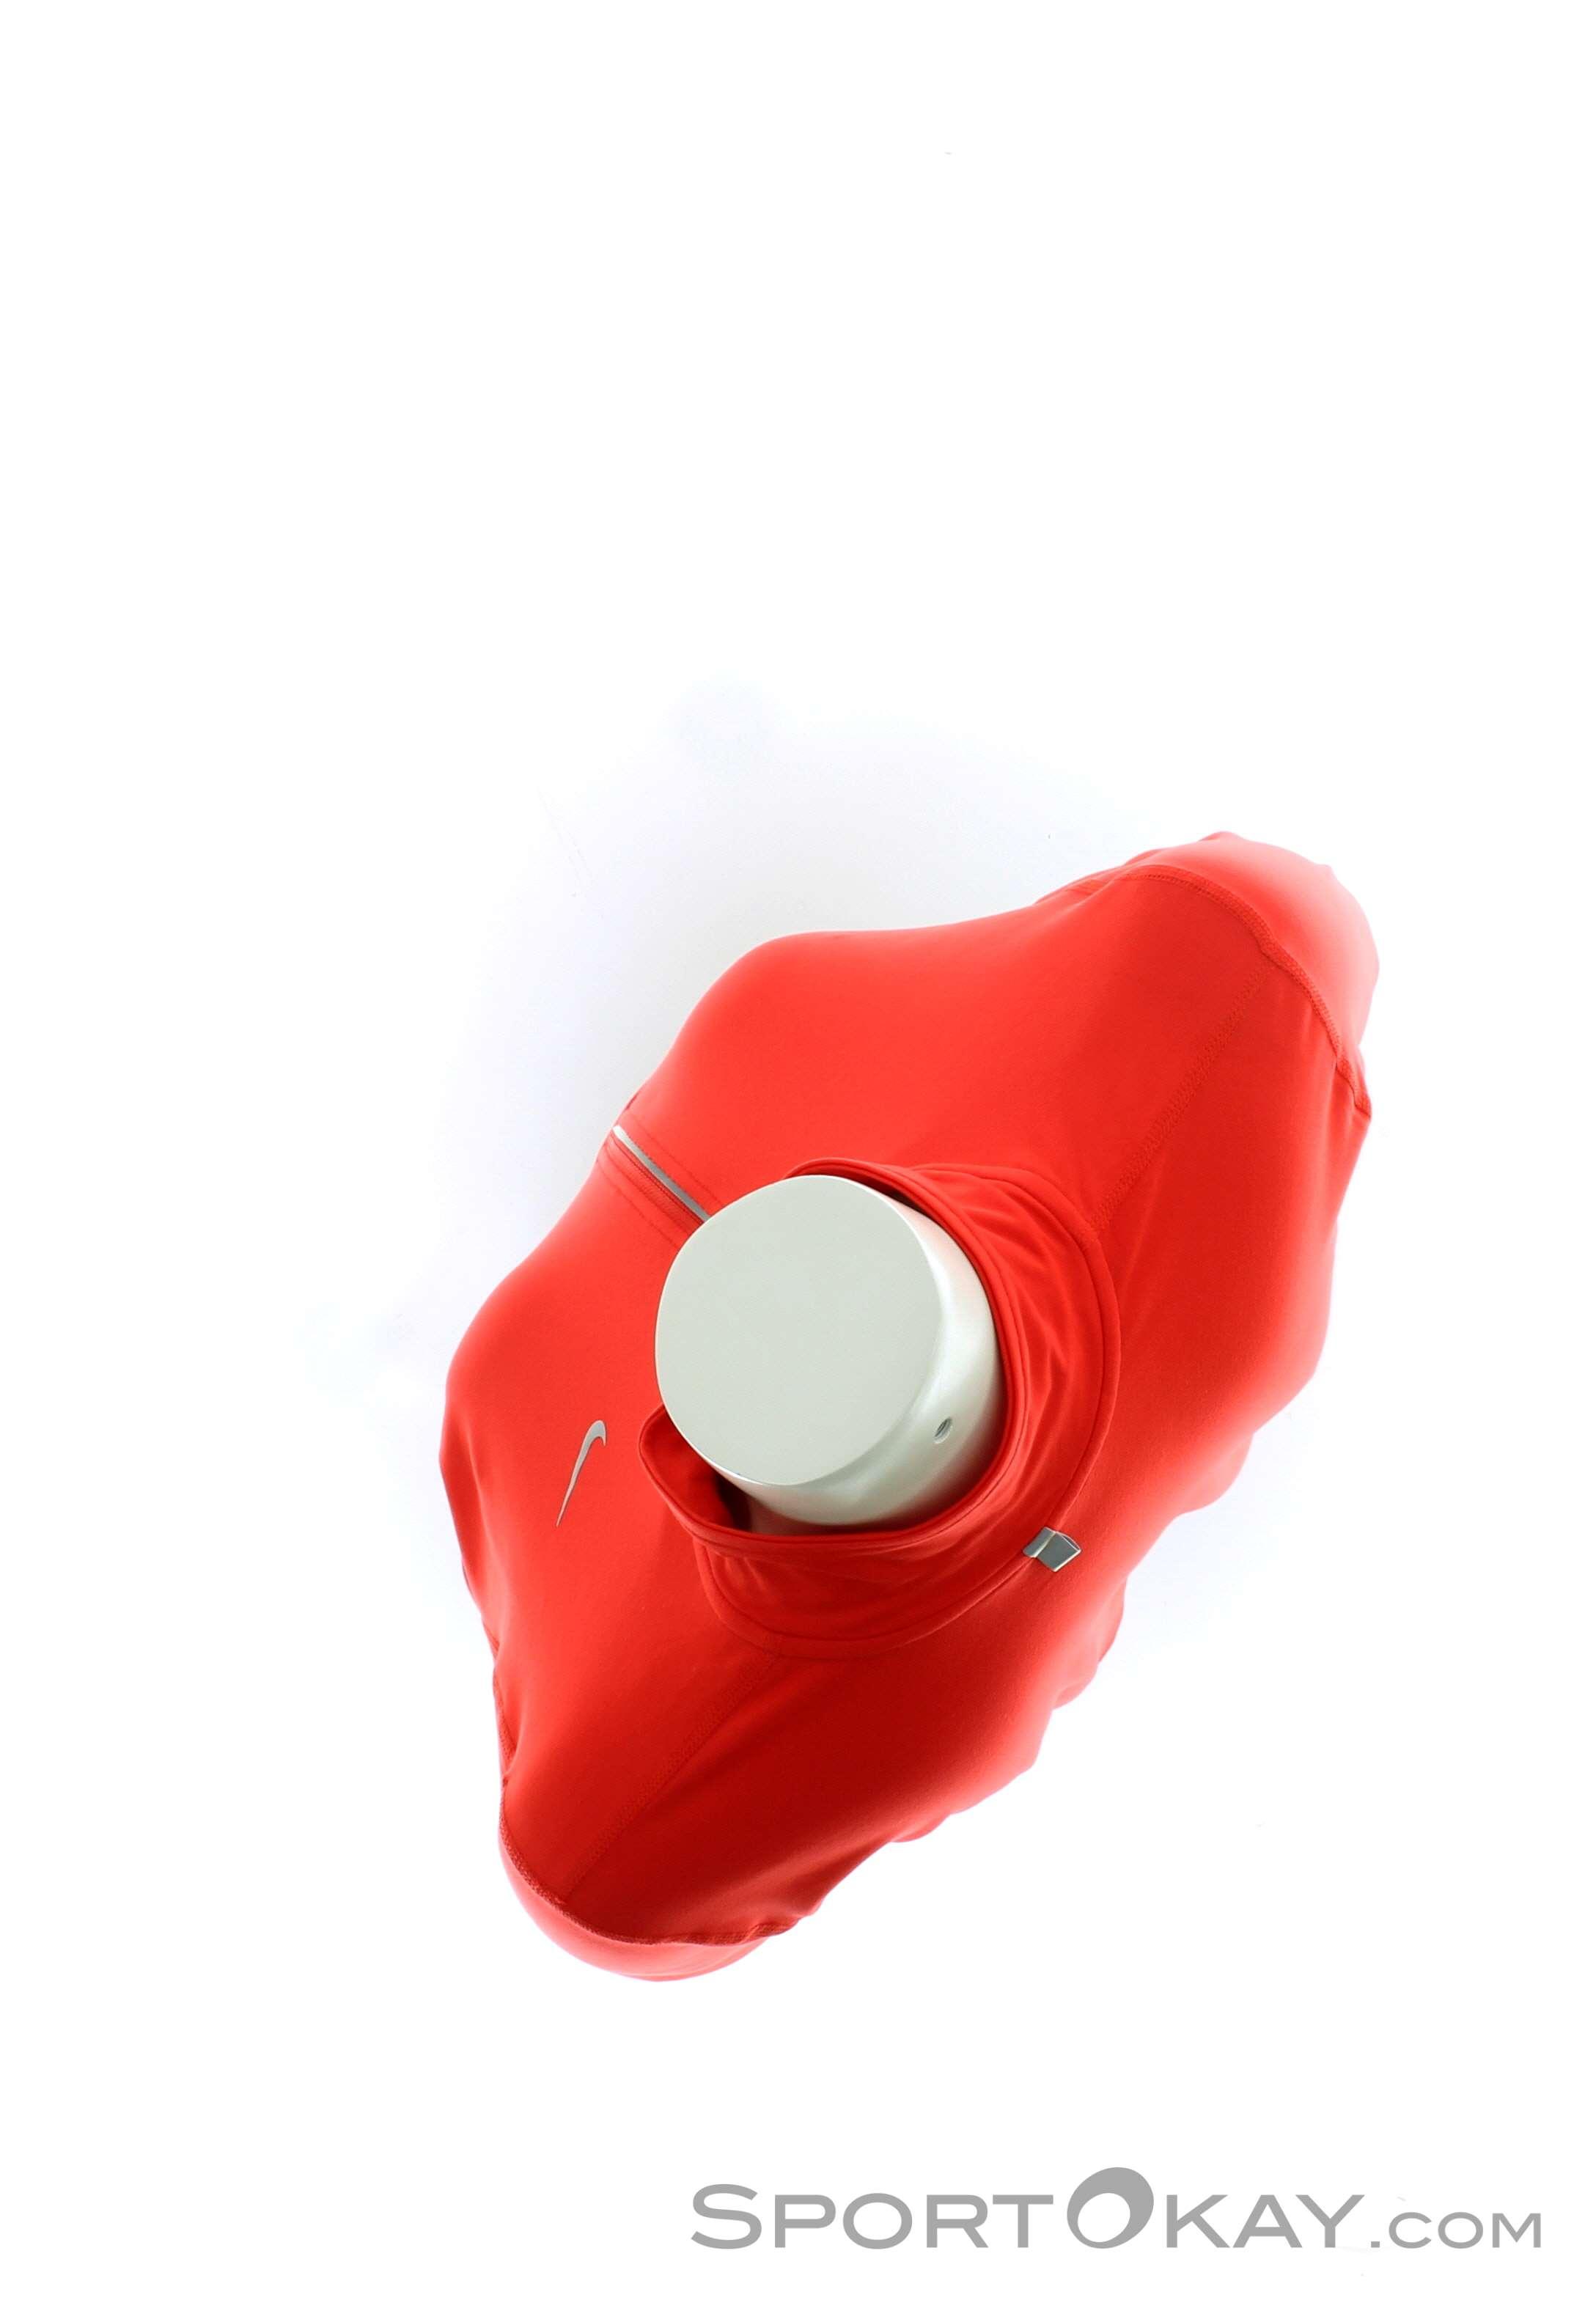 a2906b8765 Nike Element Half Zip Womens Running Shirt, Nike, Red, , Female, 0026